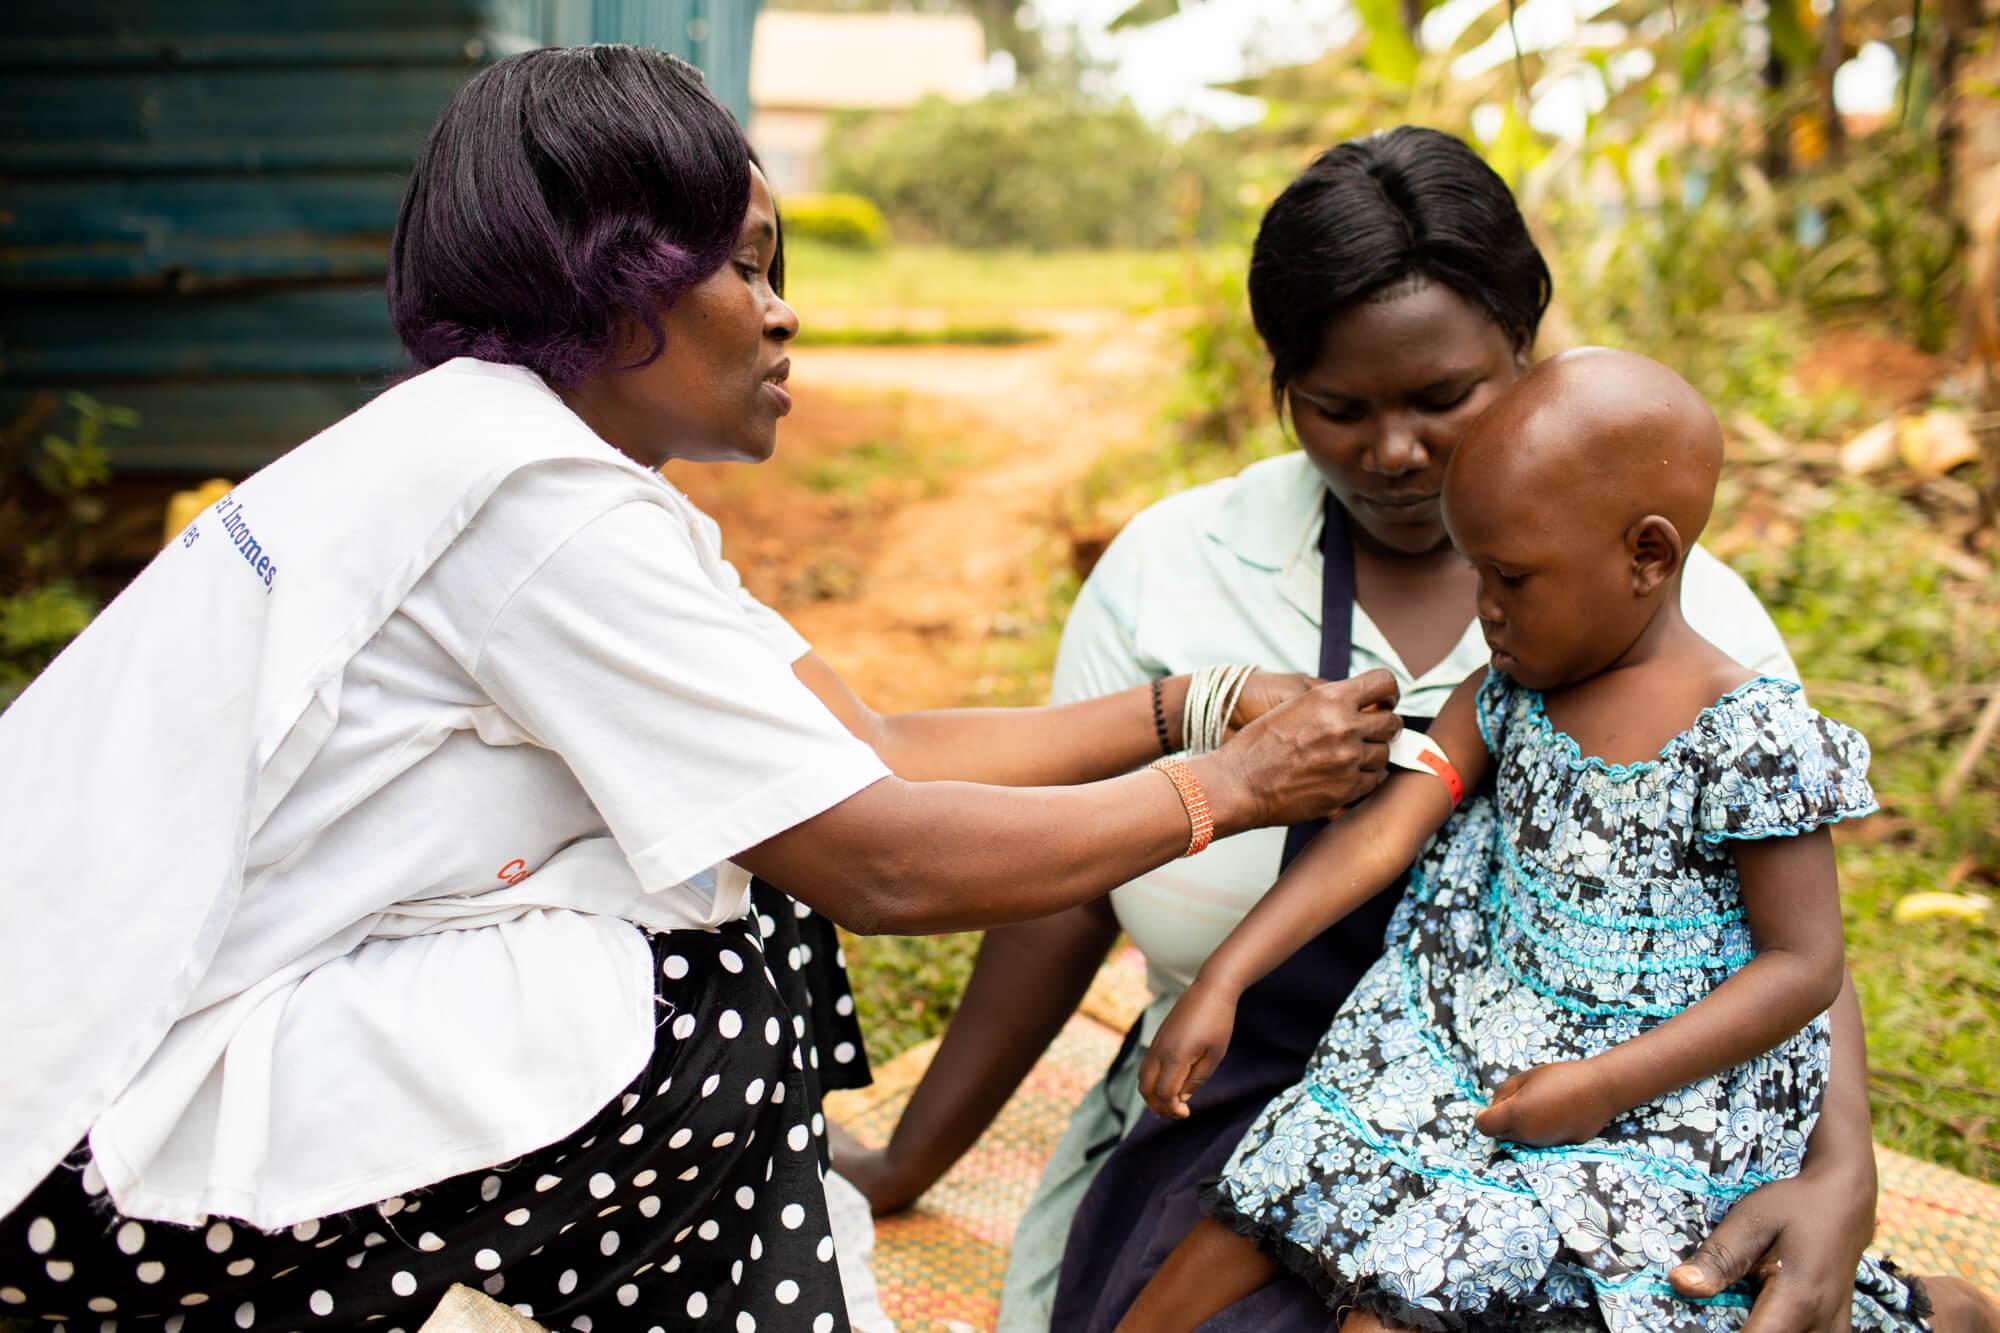 Christine checking child for malnutrition